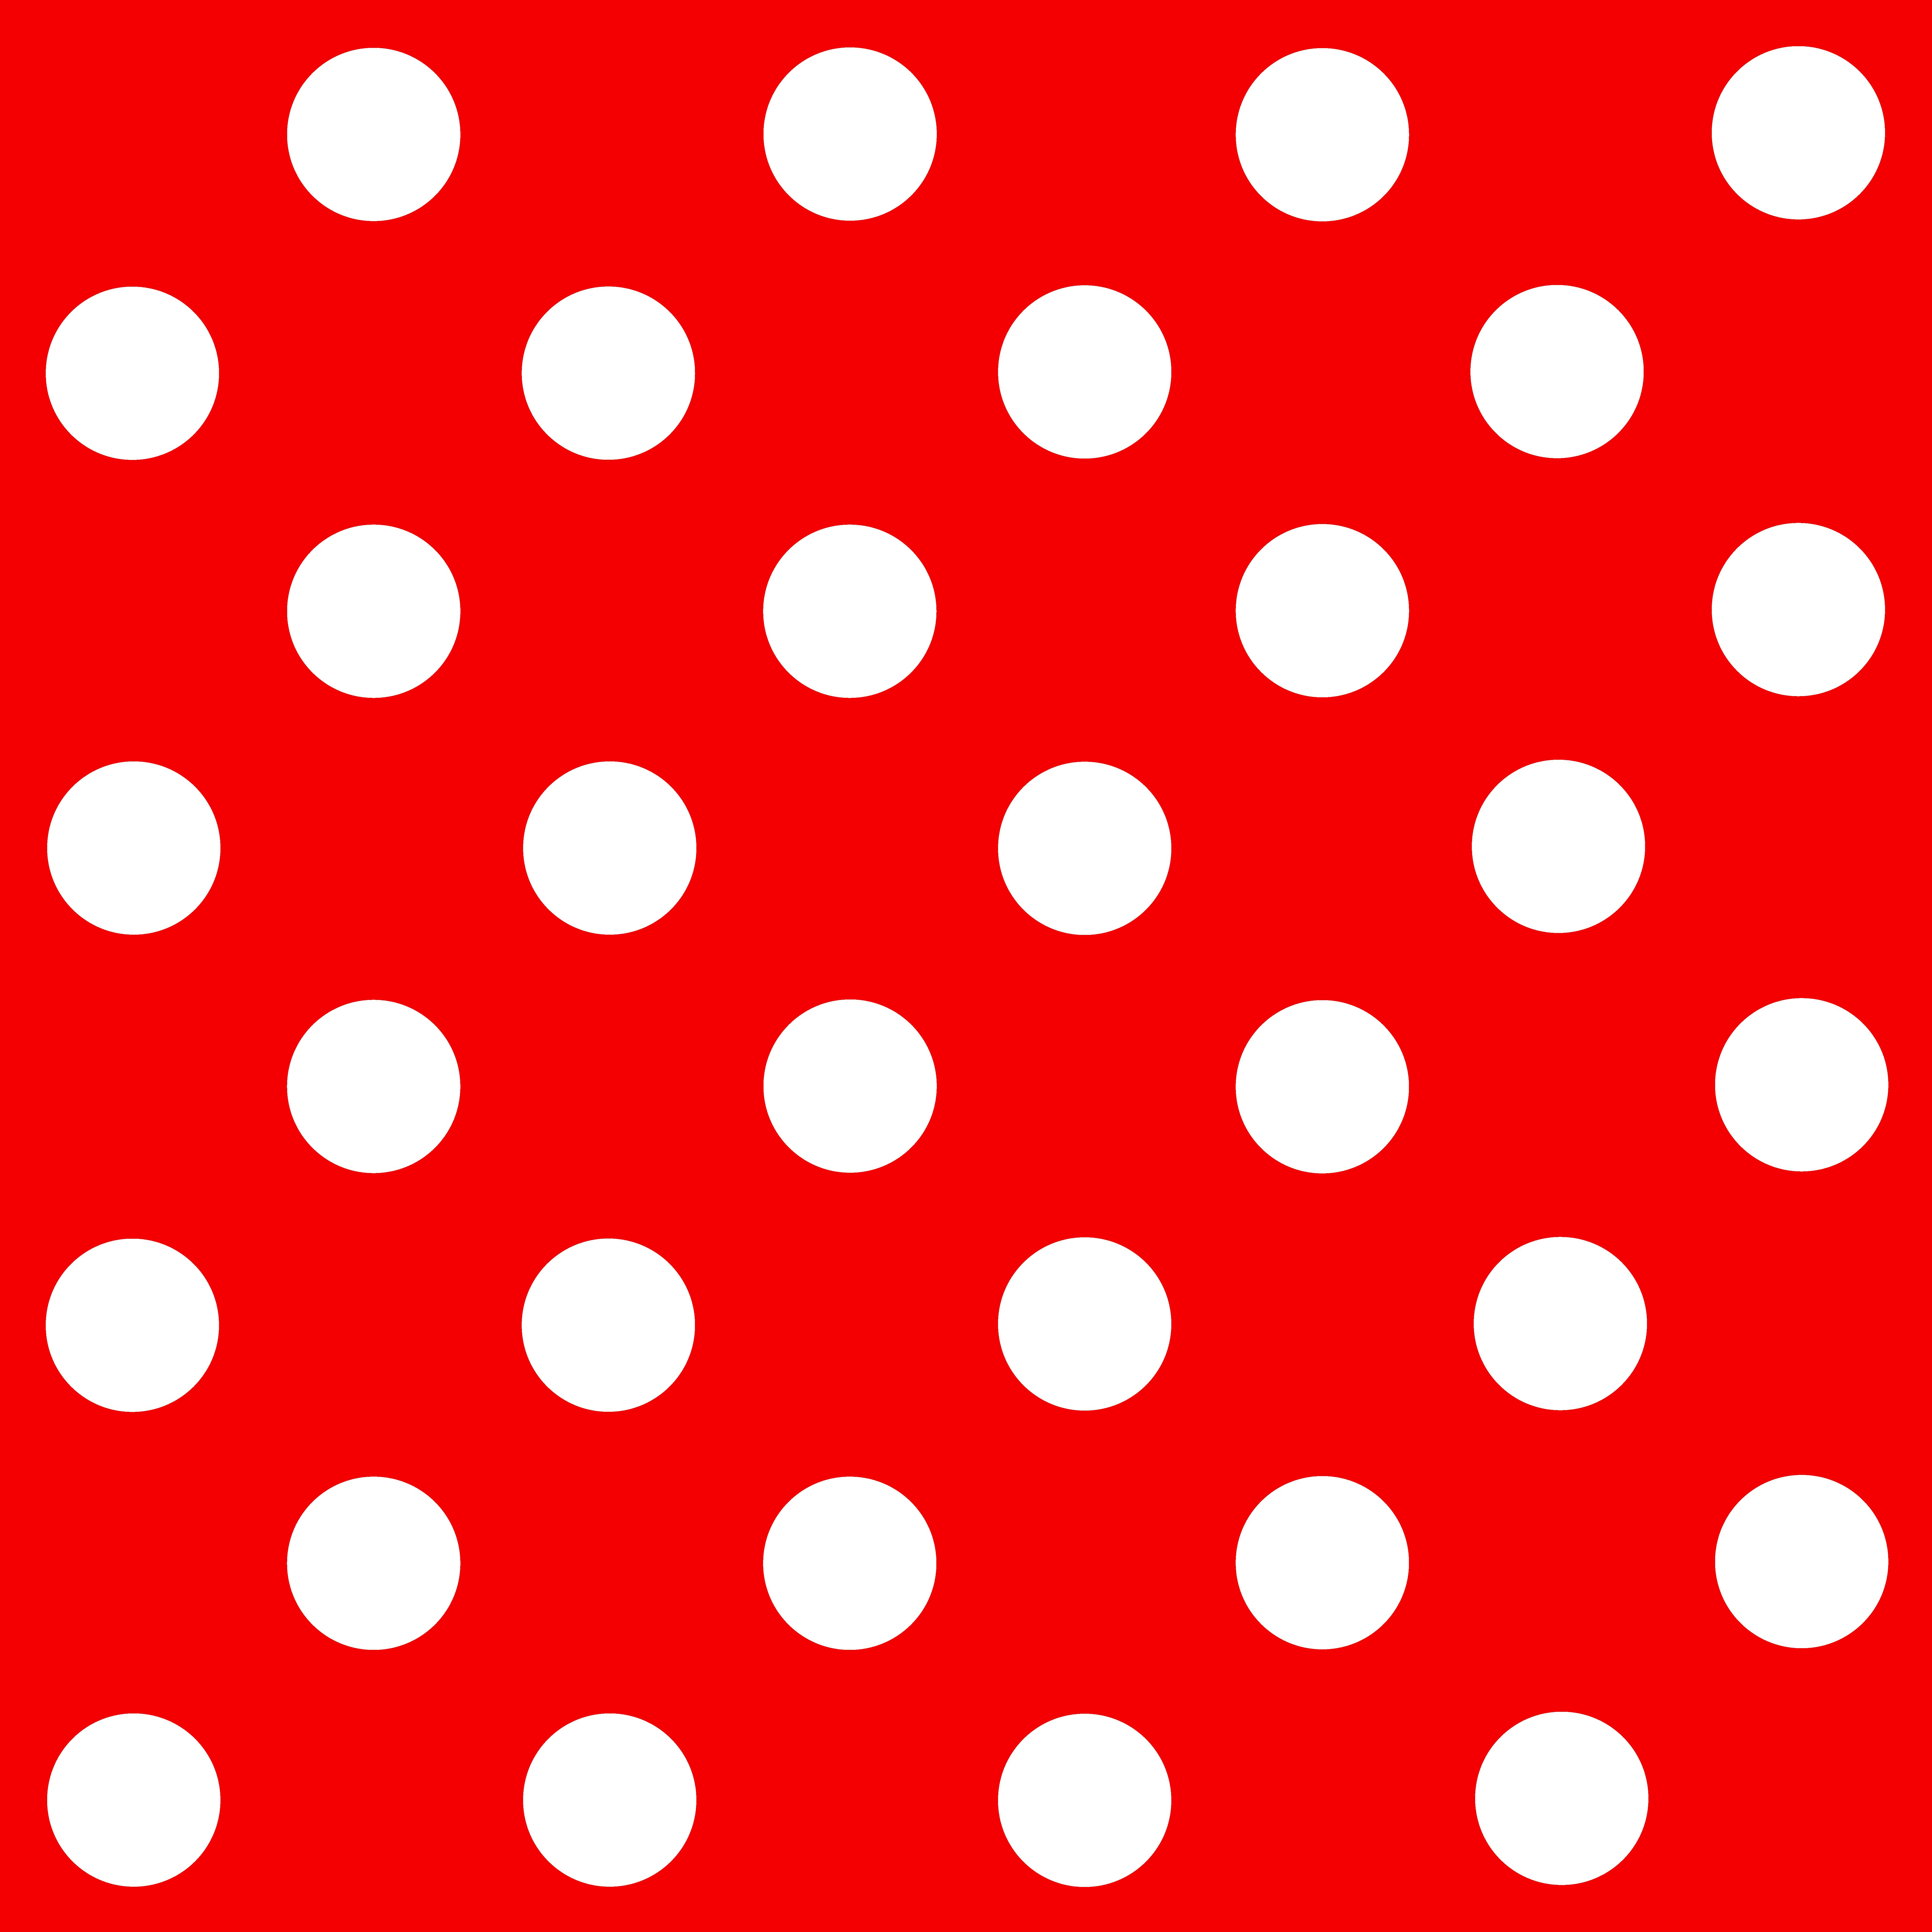 clipart background red and green polka dot clipartfest epic car rh pinterest com polka dot background clipart pink polka dot background clipart